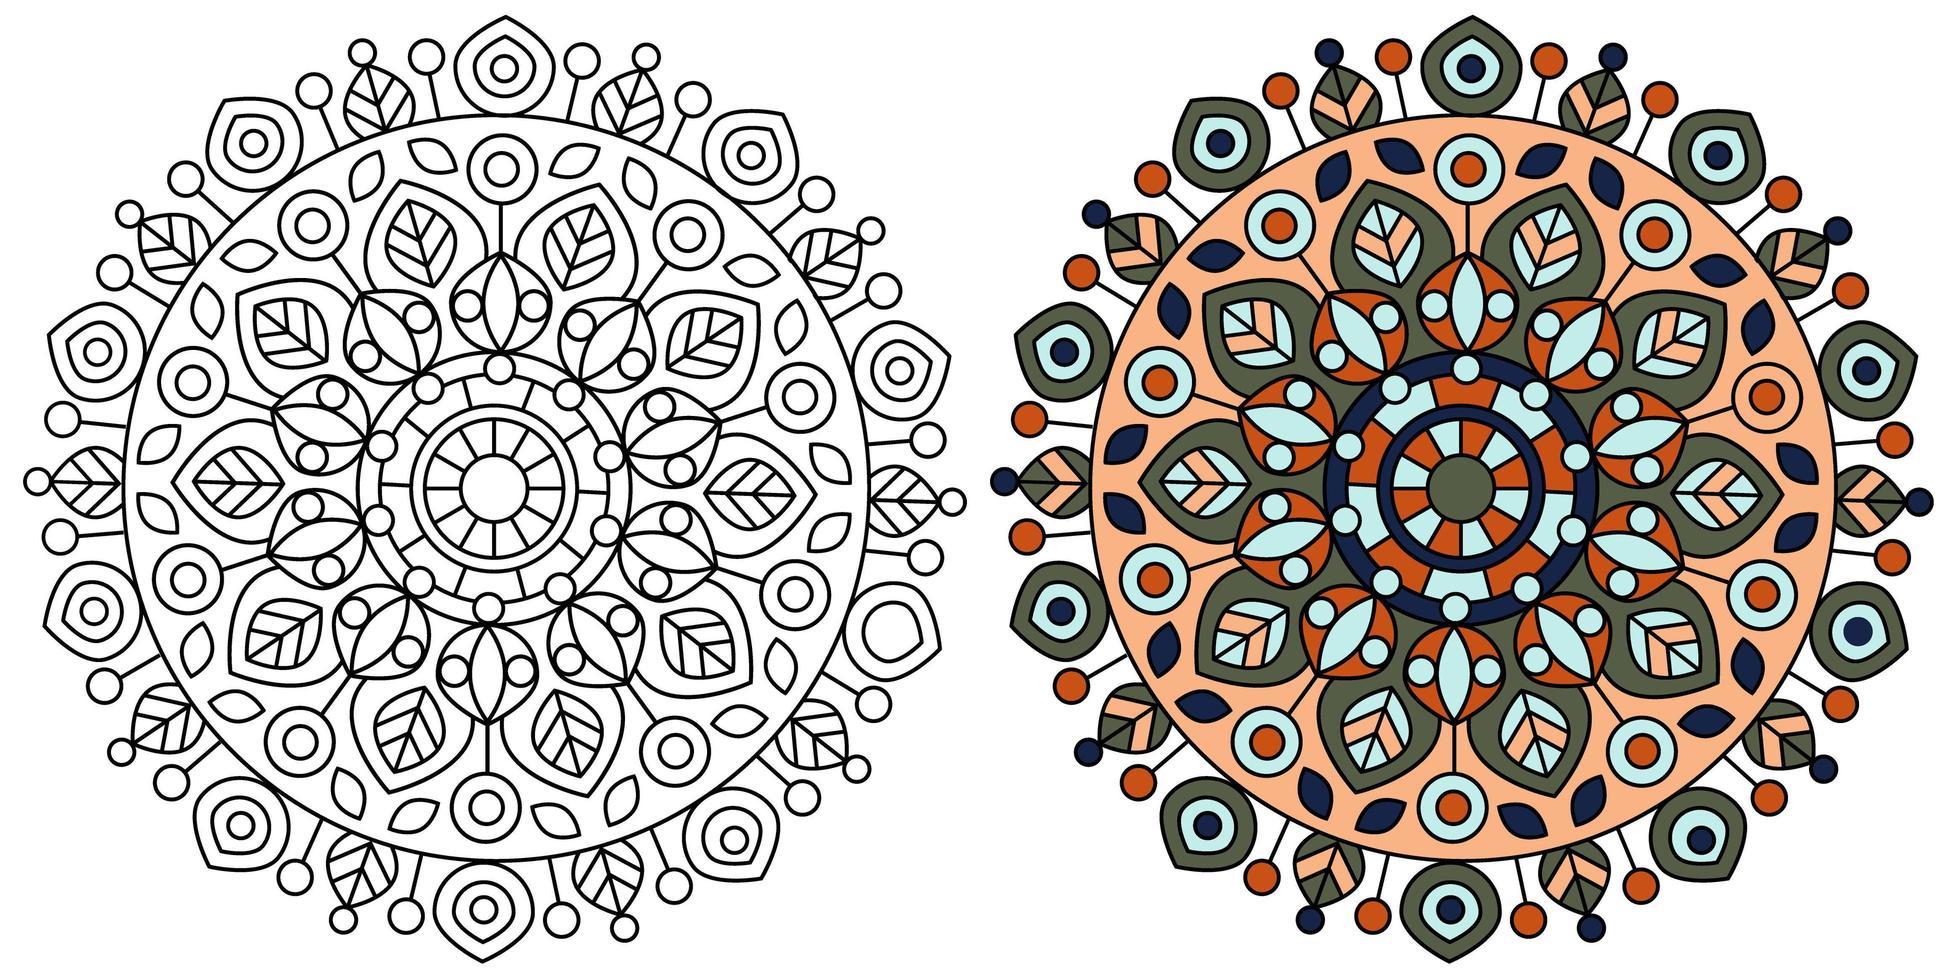 moderne Mandala Design Malvorlagen Vorlage vektor